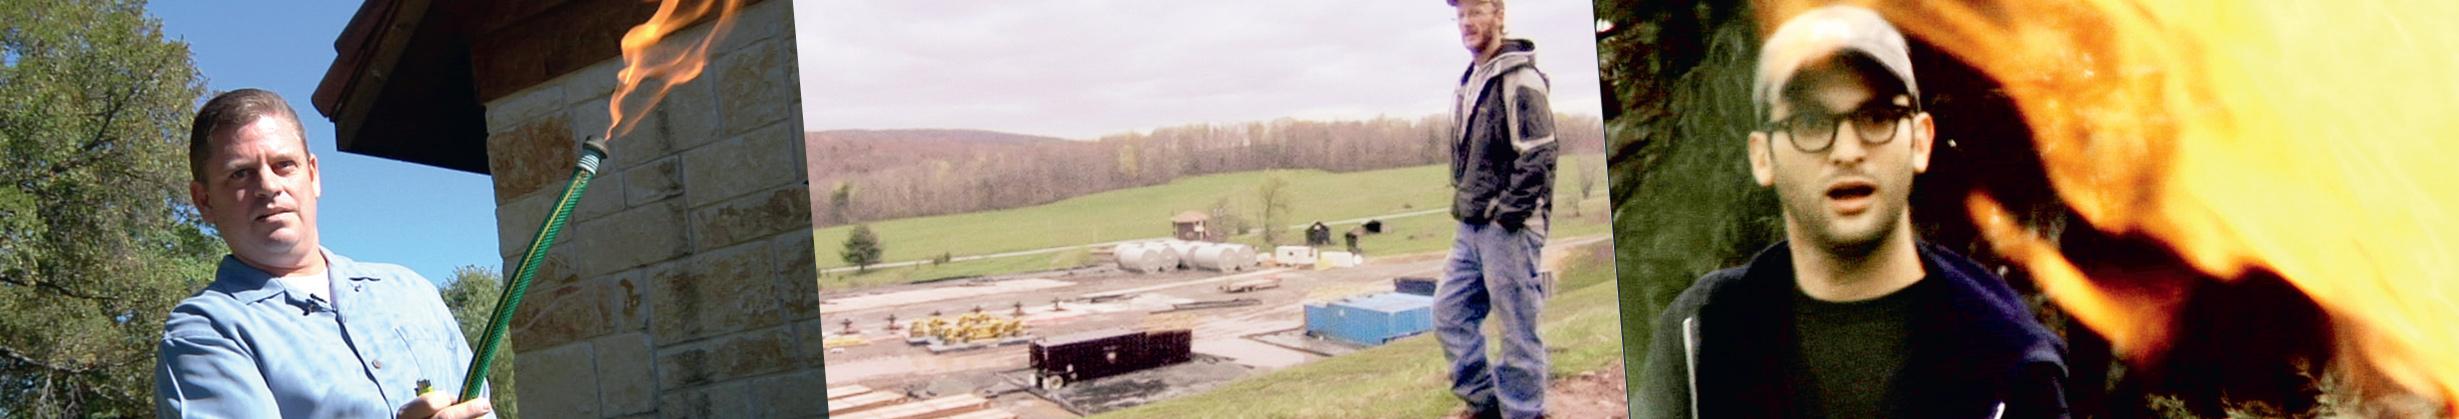 Stills from Gasland Part 2.